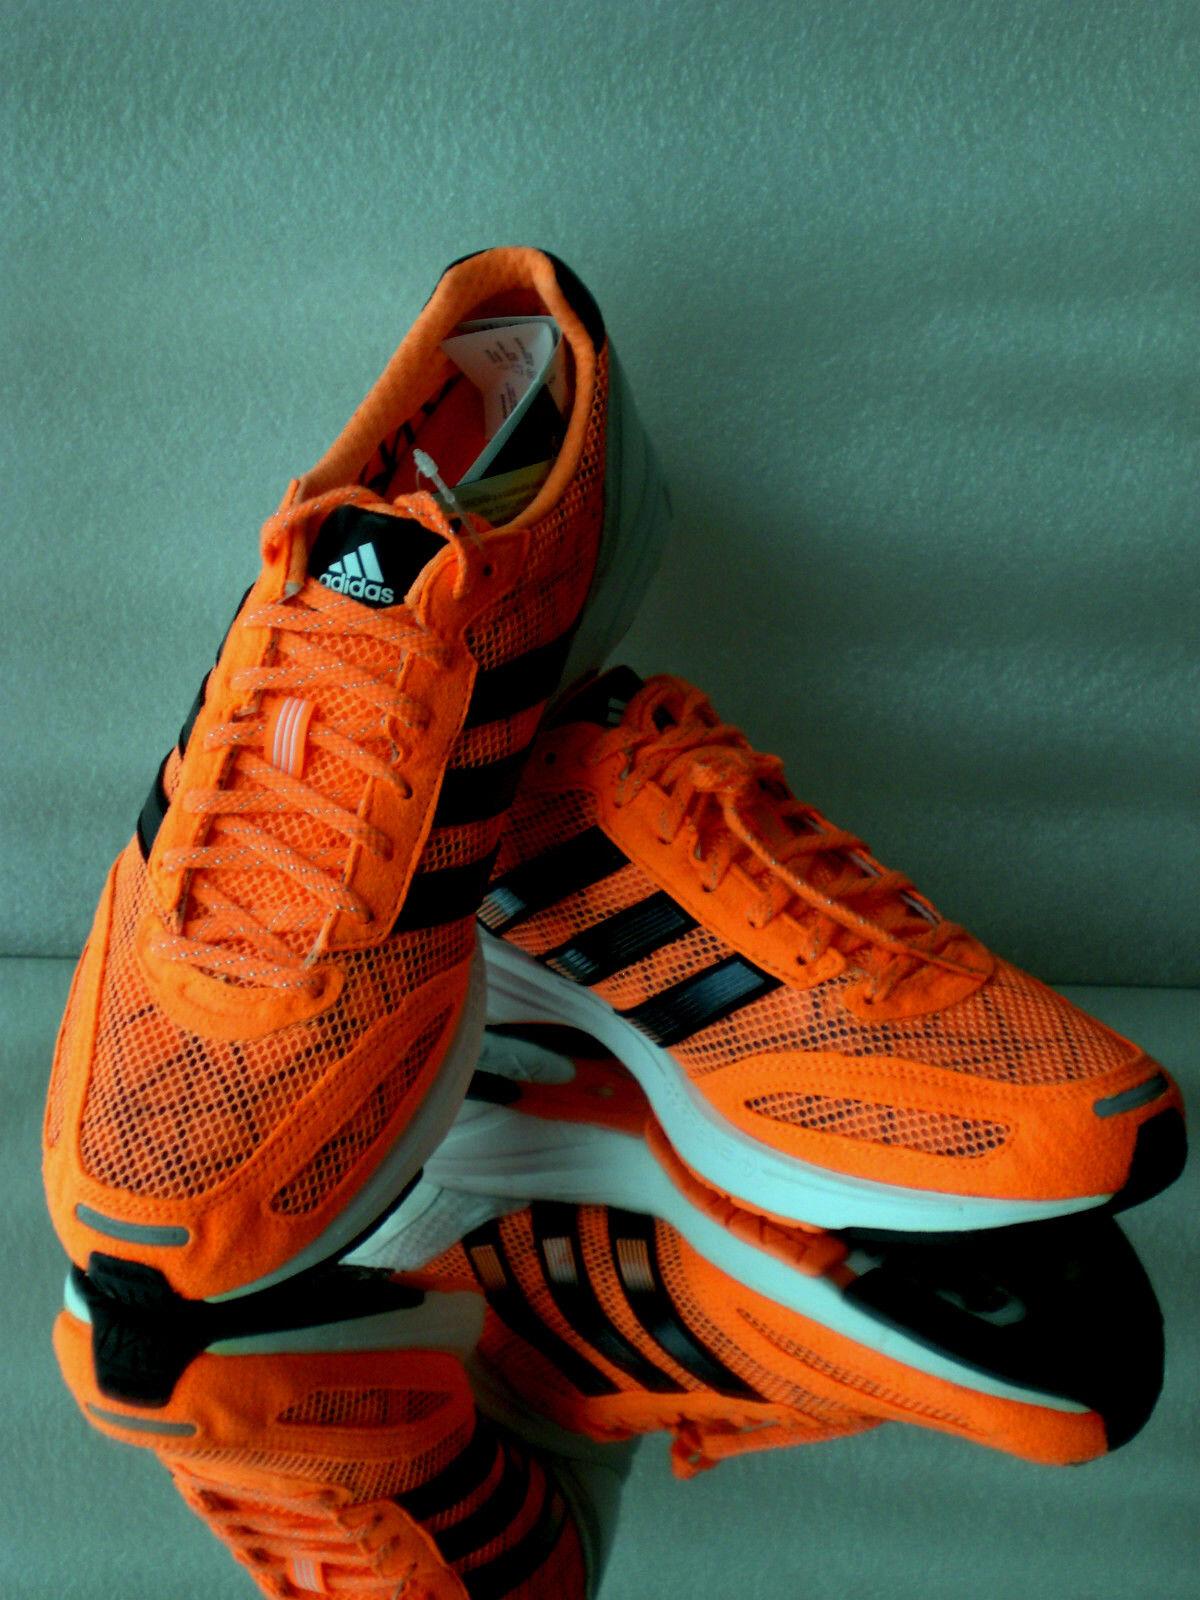 buy online 2e706 8f898 Nike Air Max 90 ultra 2.0 flyknit flyknit flyknit grey Trainers shoes  896497 004 eur 42 50c5c0